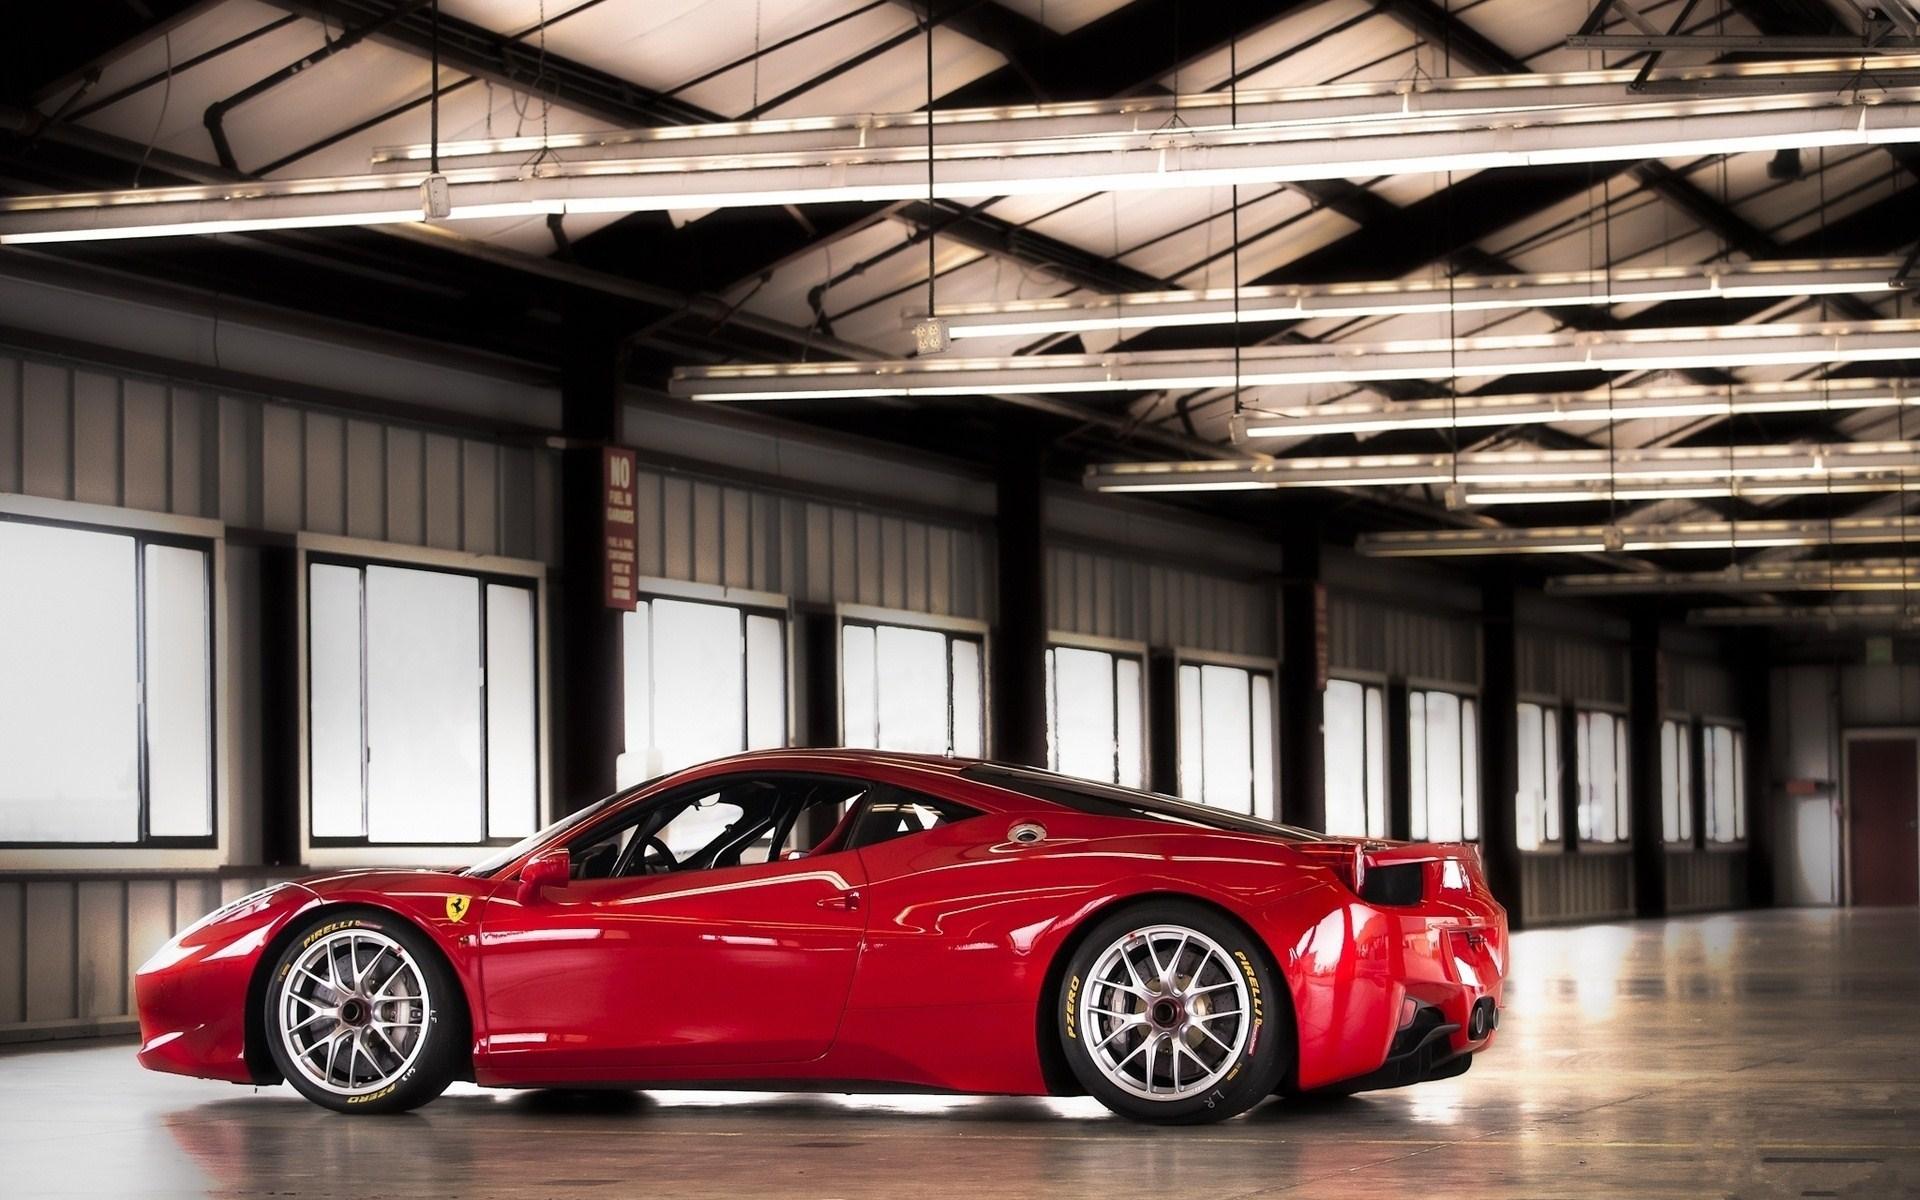 Red Ferrari 458 Challenge Warehouse Photo